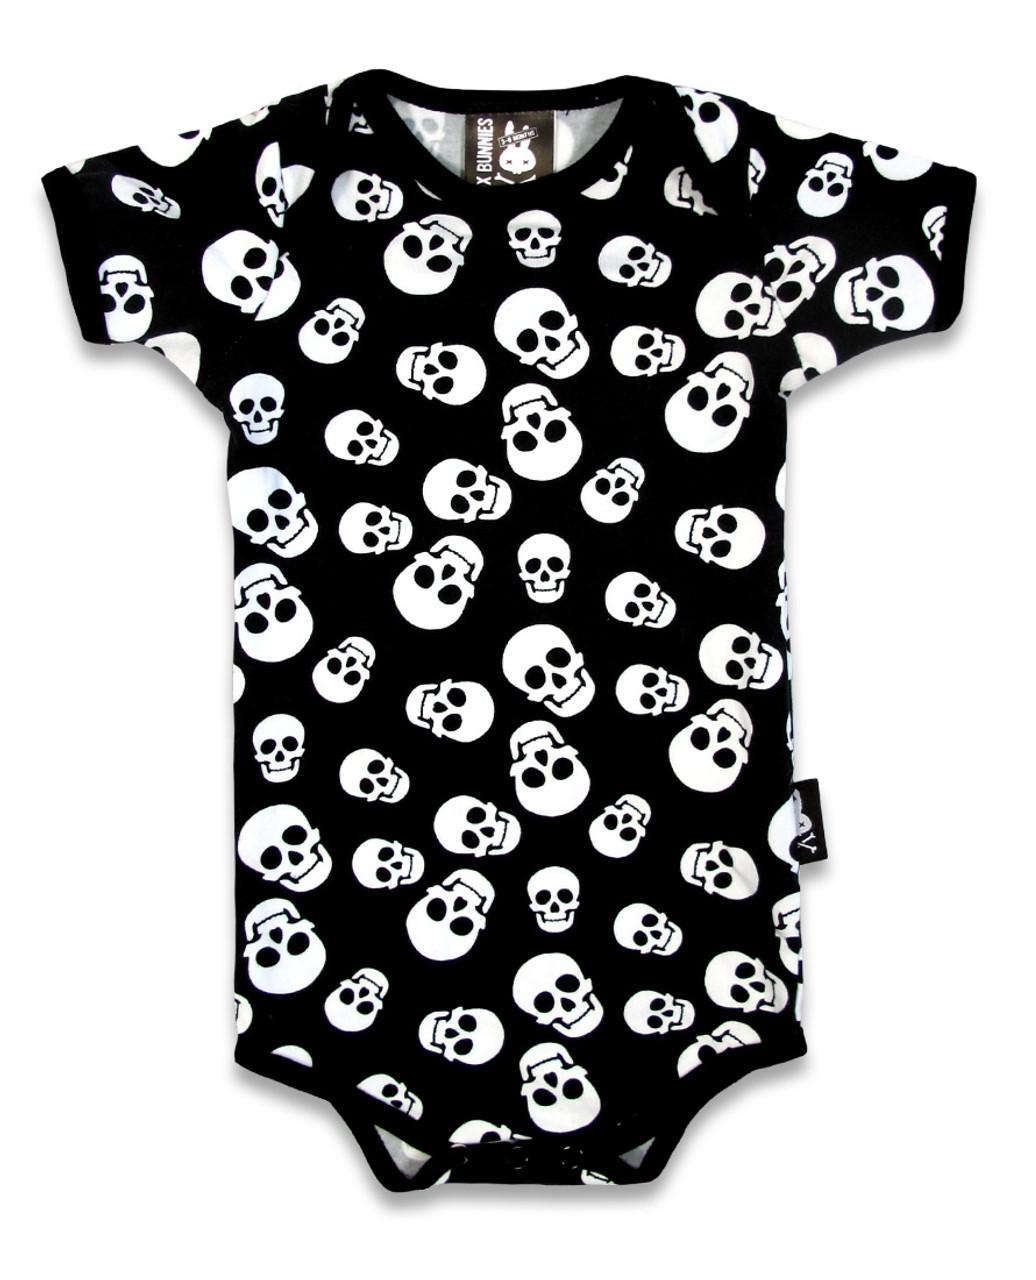 c8438d57b474 Six Bunnies Polka Skull Dot Baby Romper